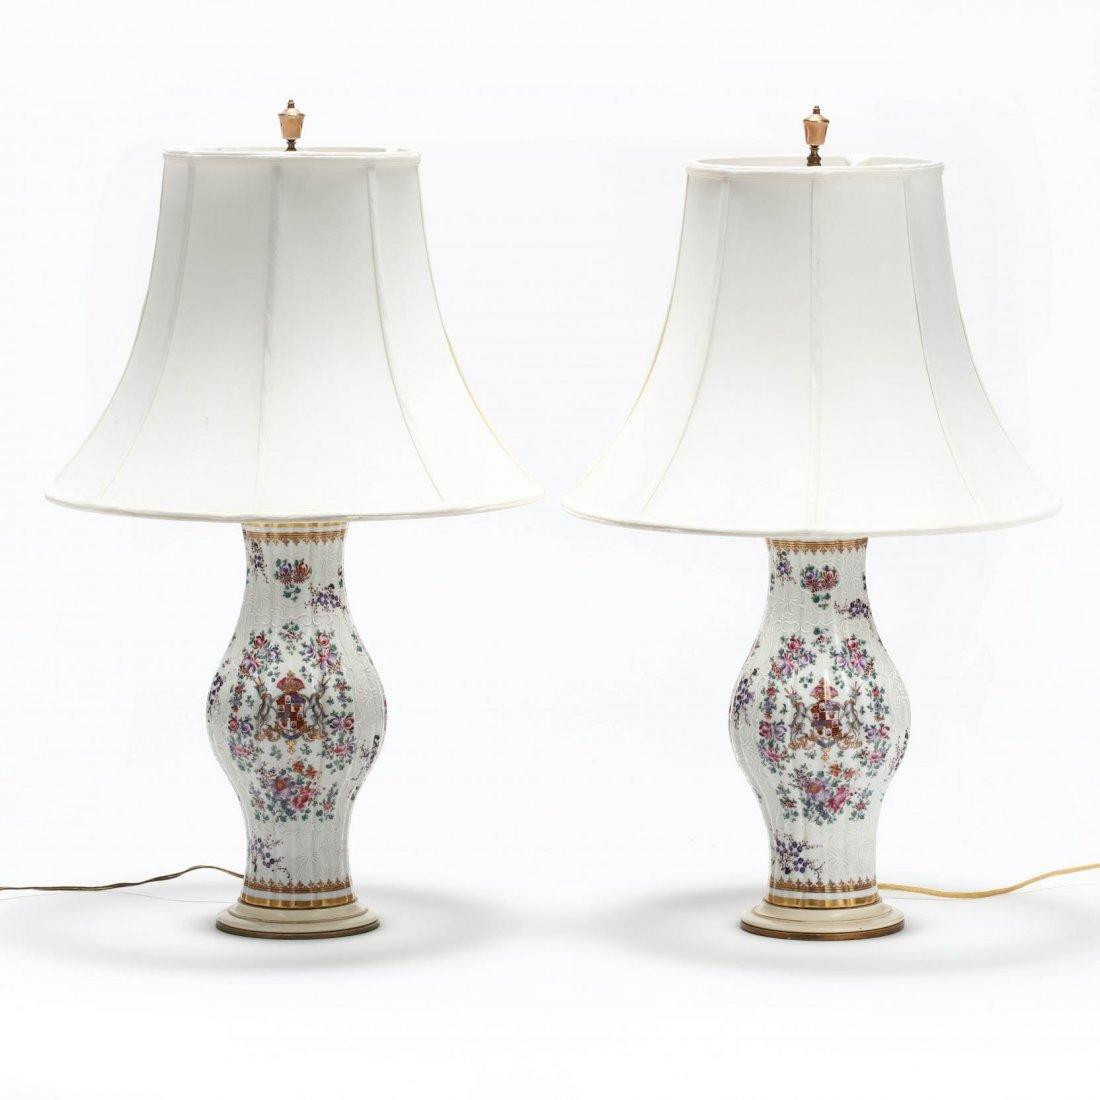 Pair of Samson Porcelain Armorial Table Lamps